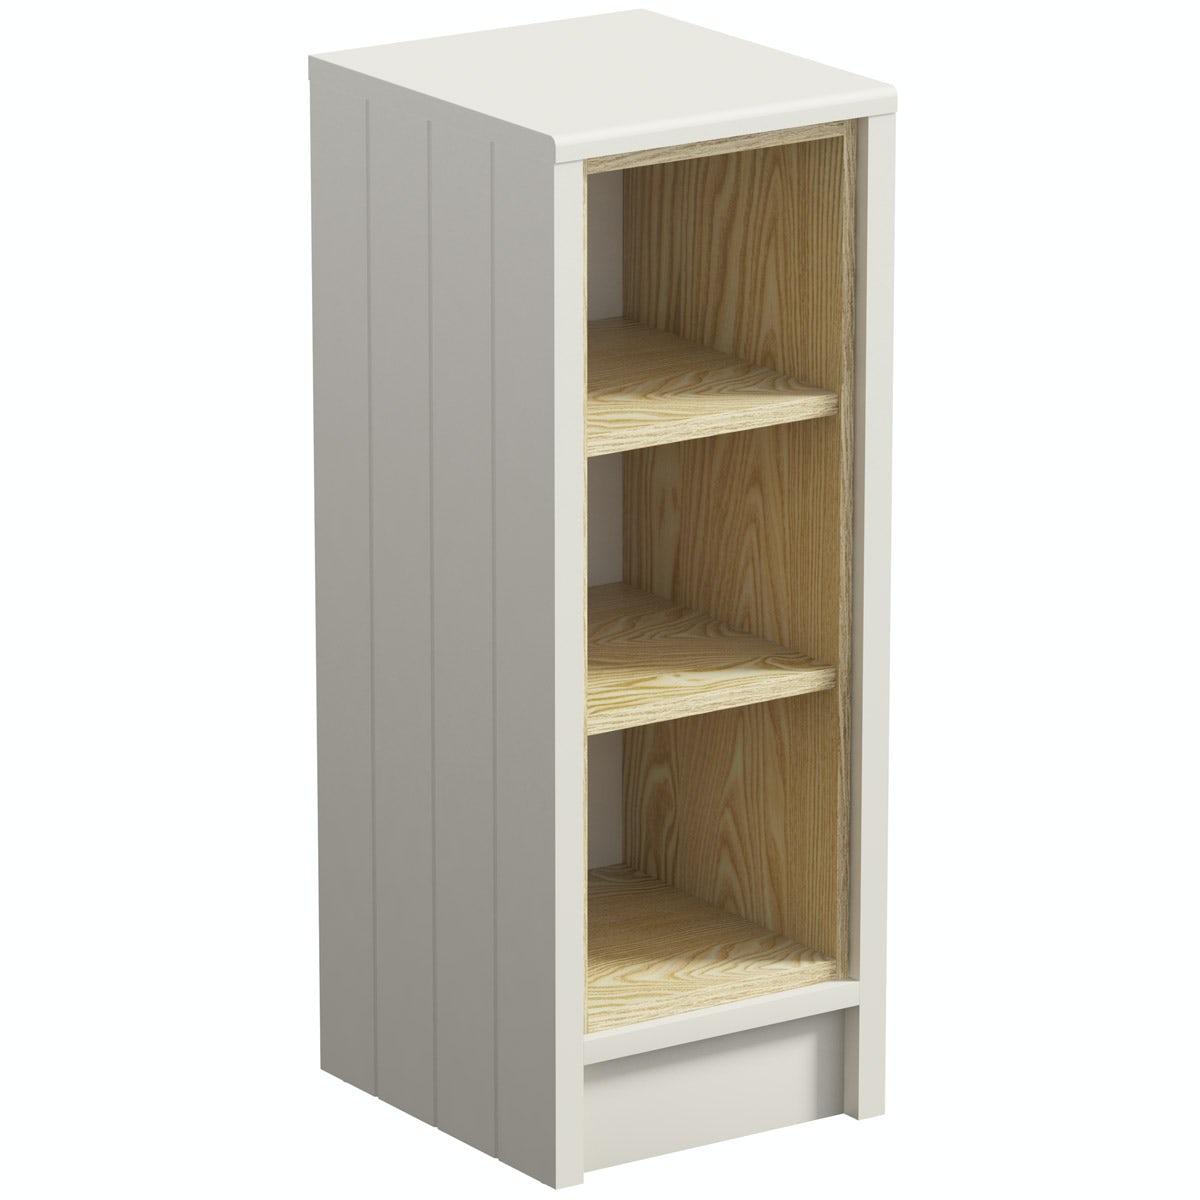 The Bath Co. Dulwich stone ivory open storage unit